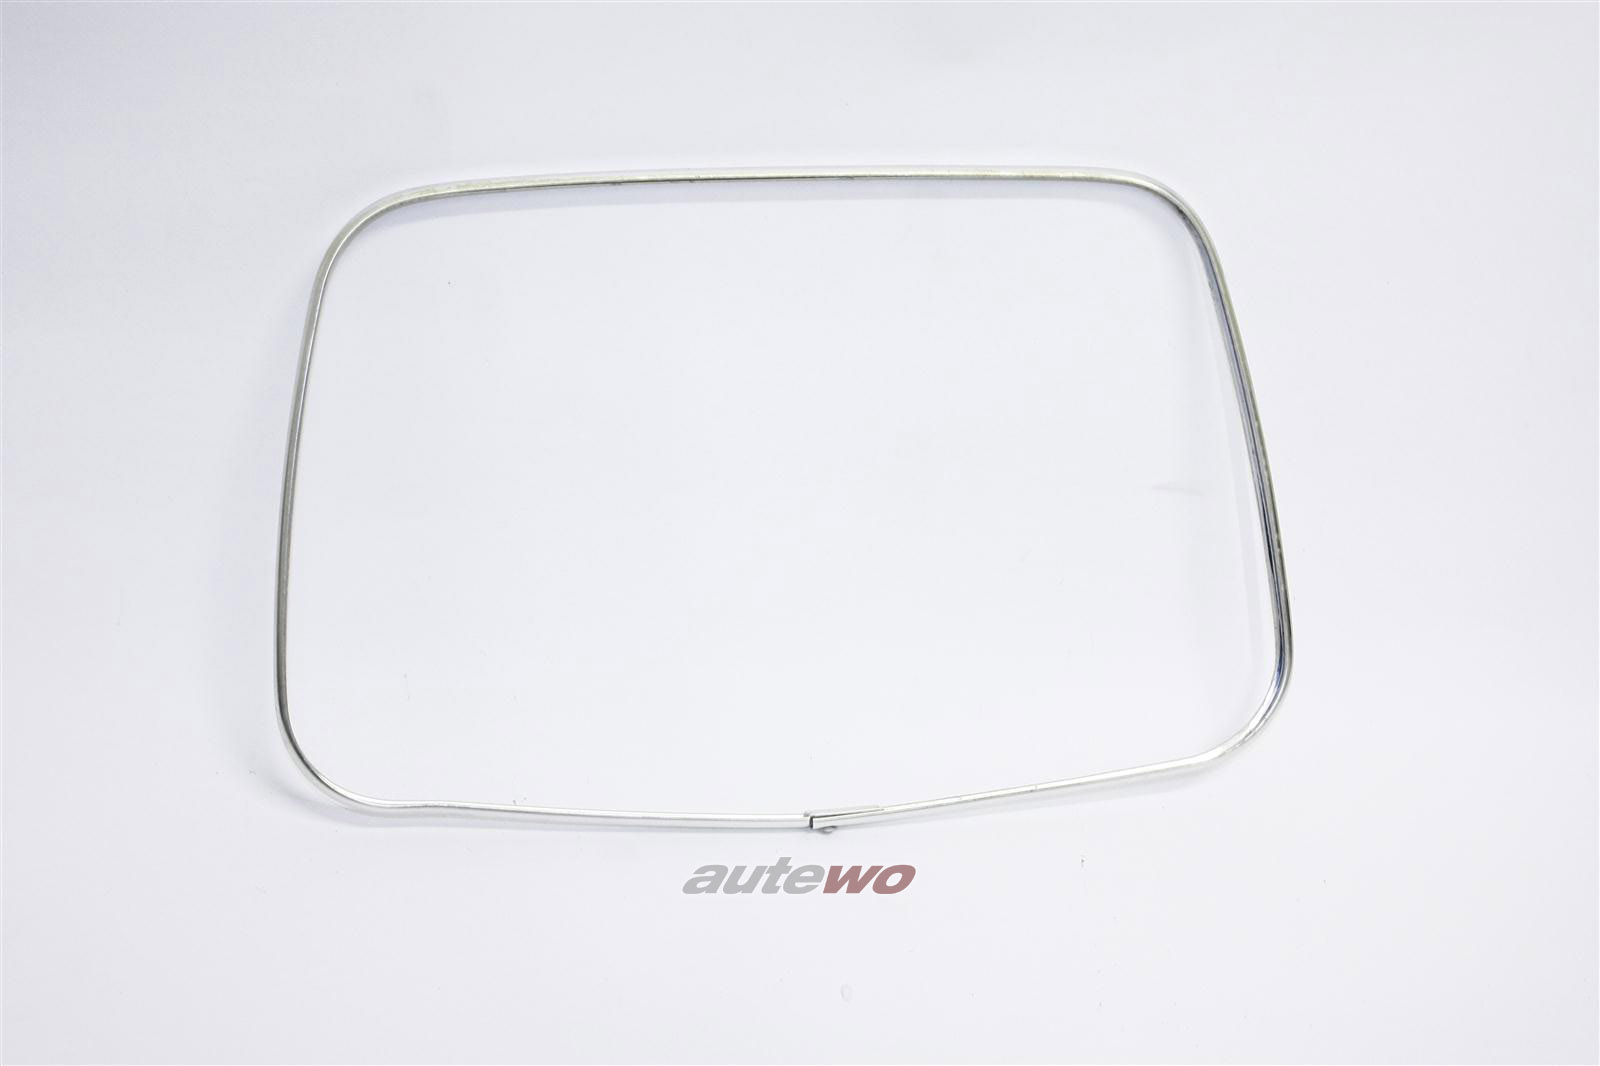 Audi 100/200 Typ 44 Zierrahmen Kopfstütze Vorne/Hinten